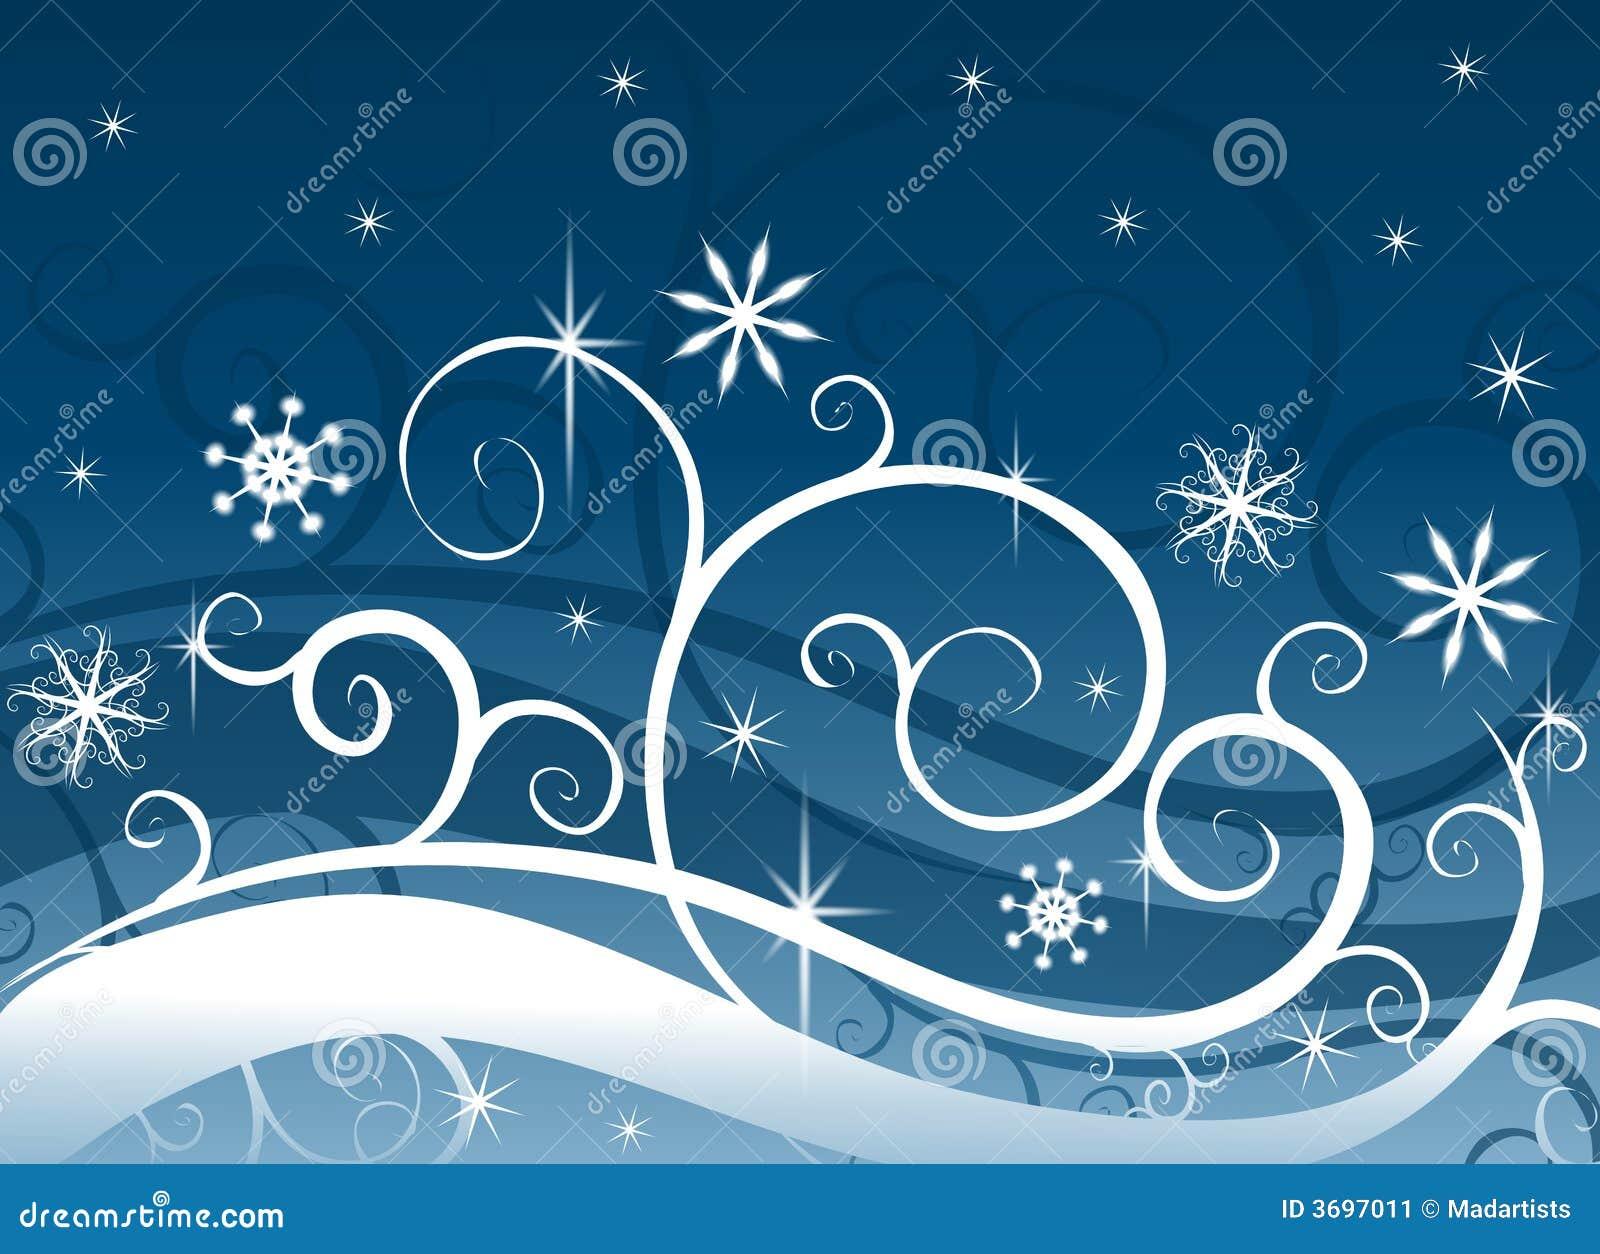 голубая страна чудес зимы снежинок